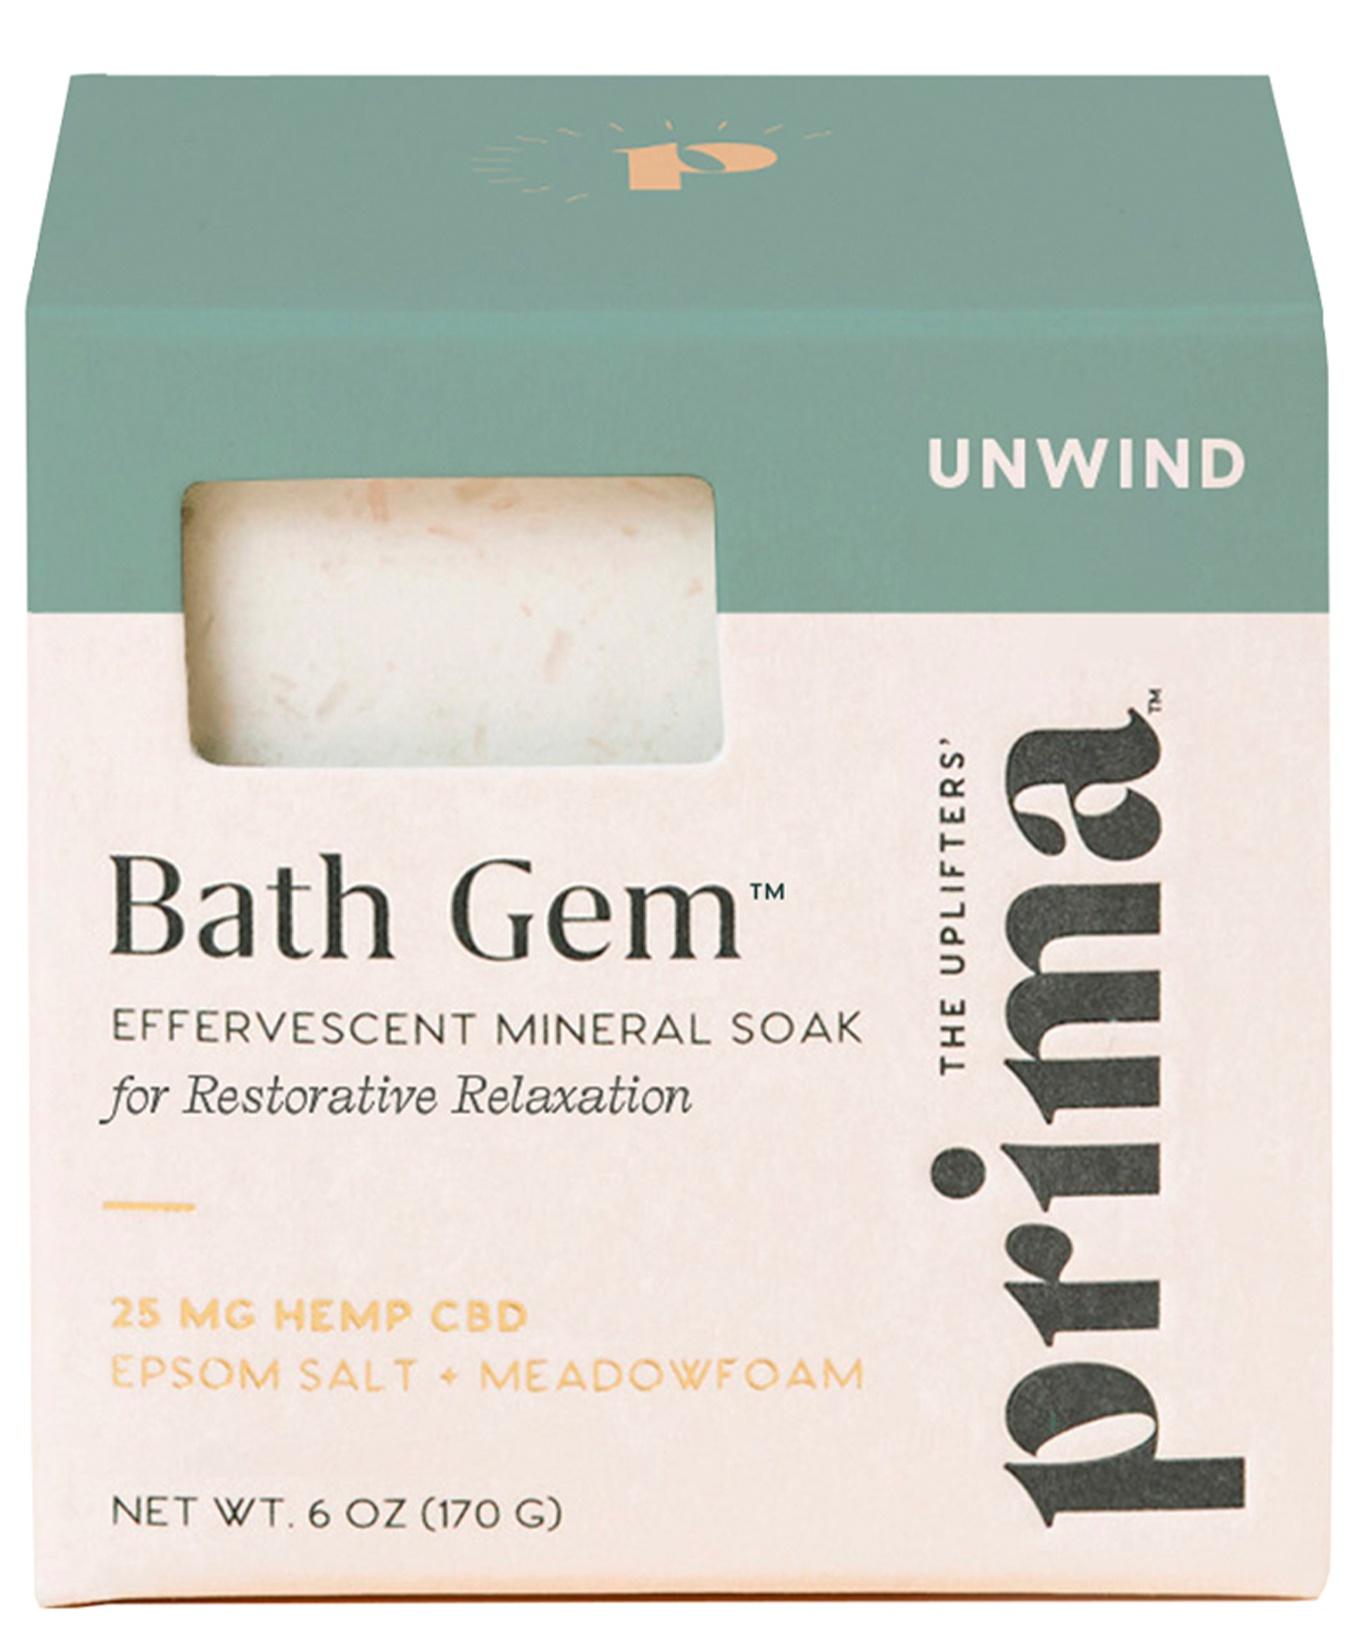 Prima Bath Gem Effervescent Mineral Soak